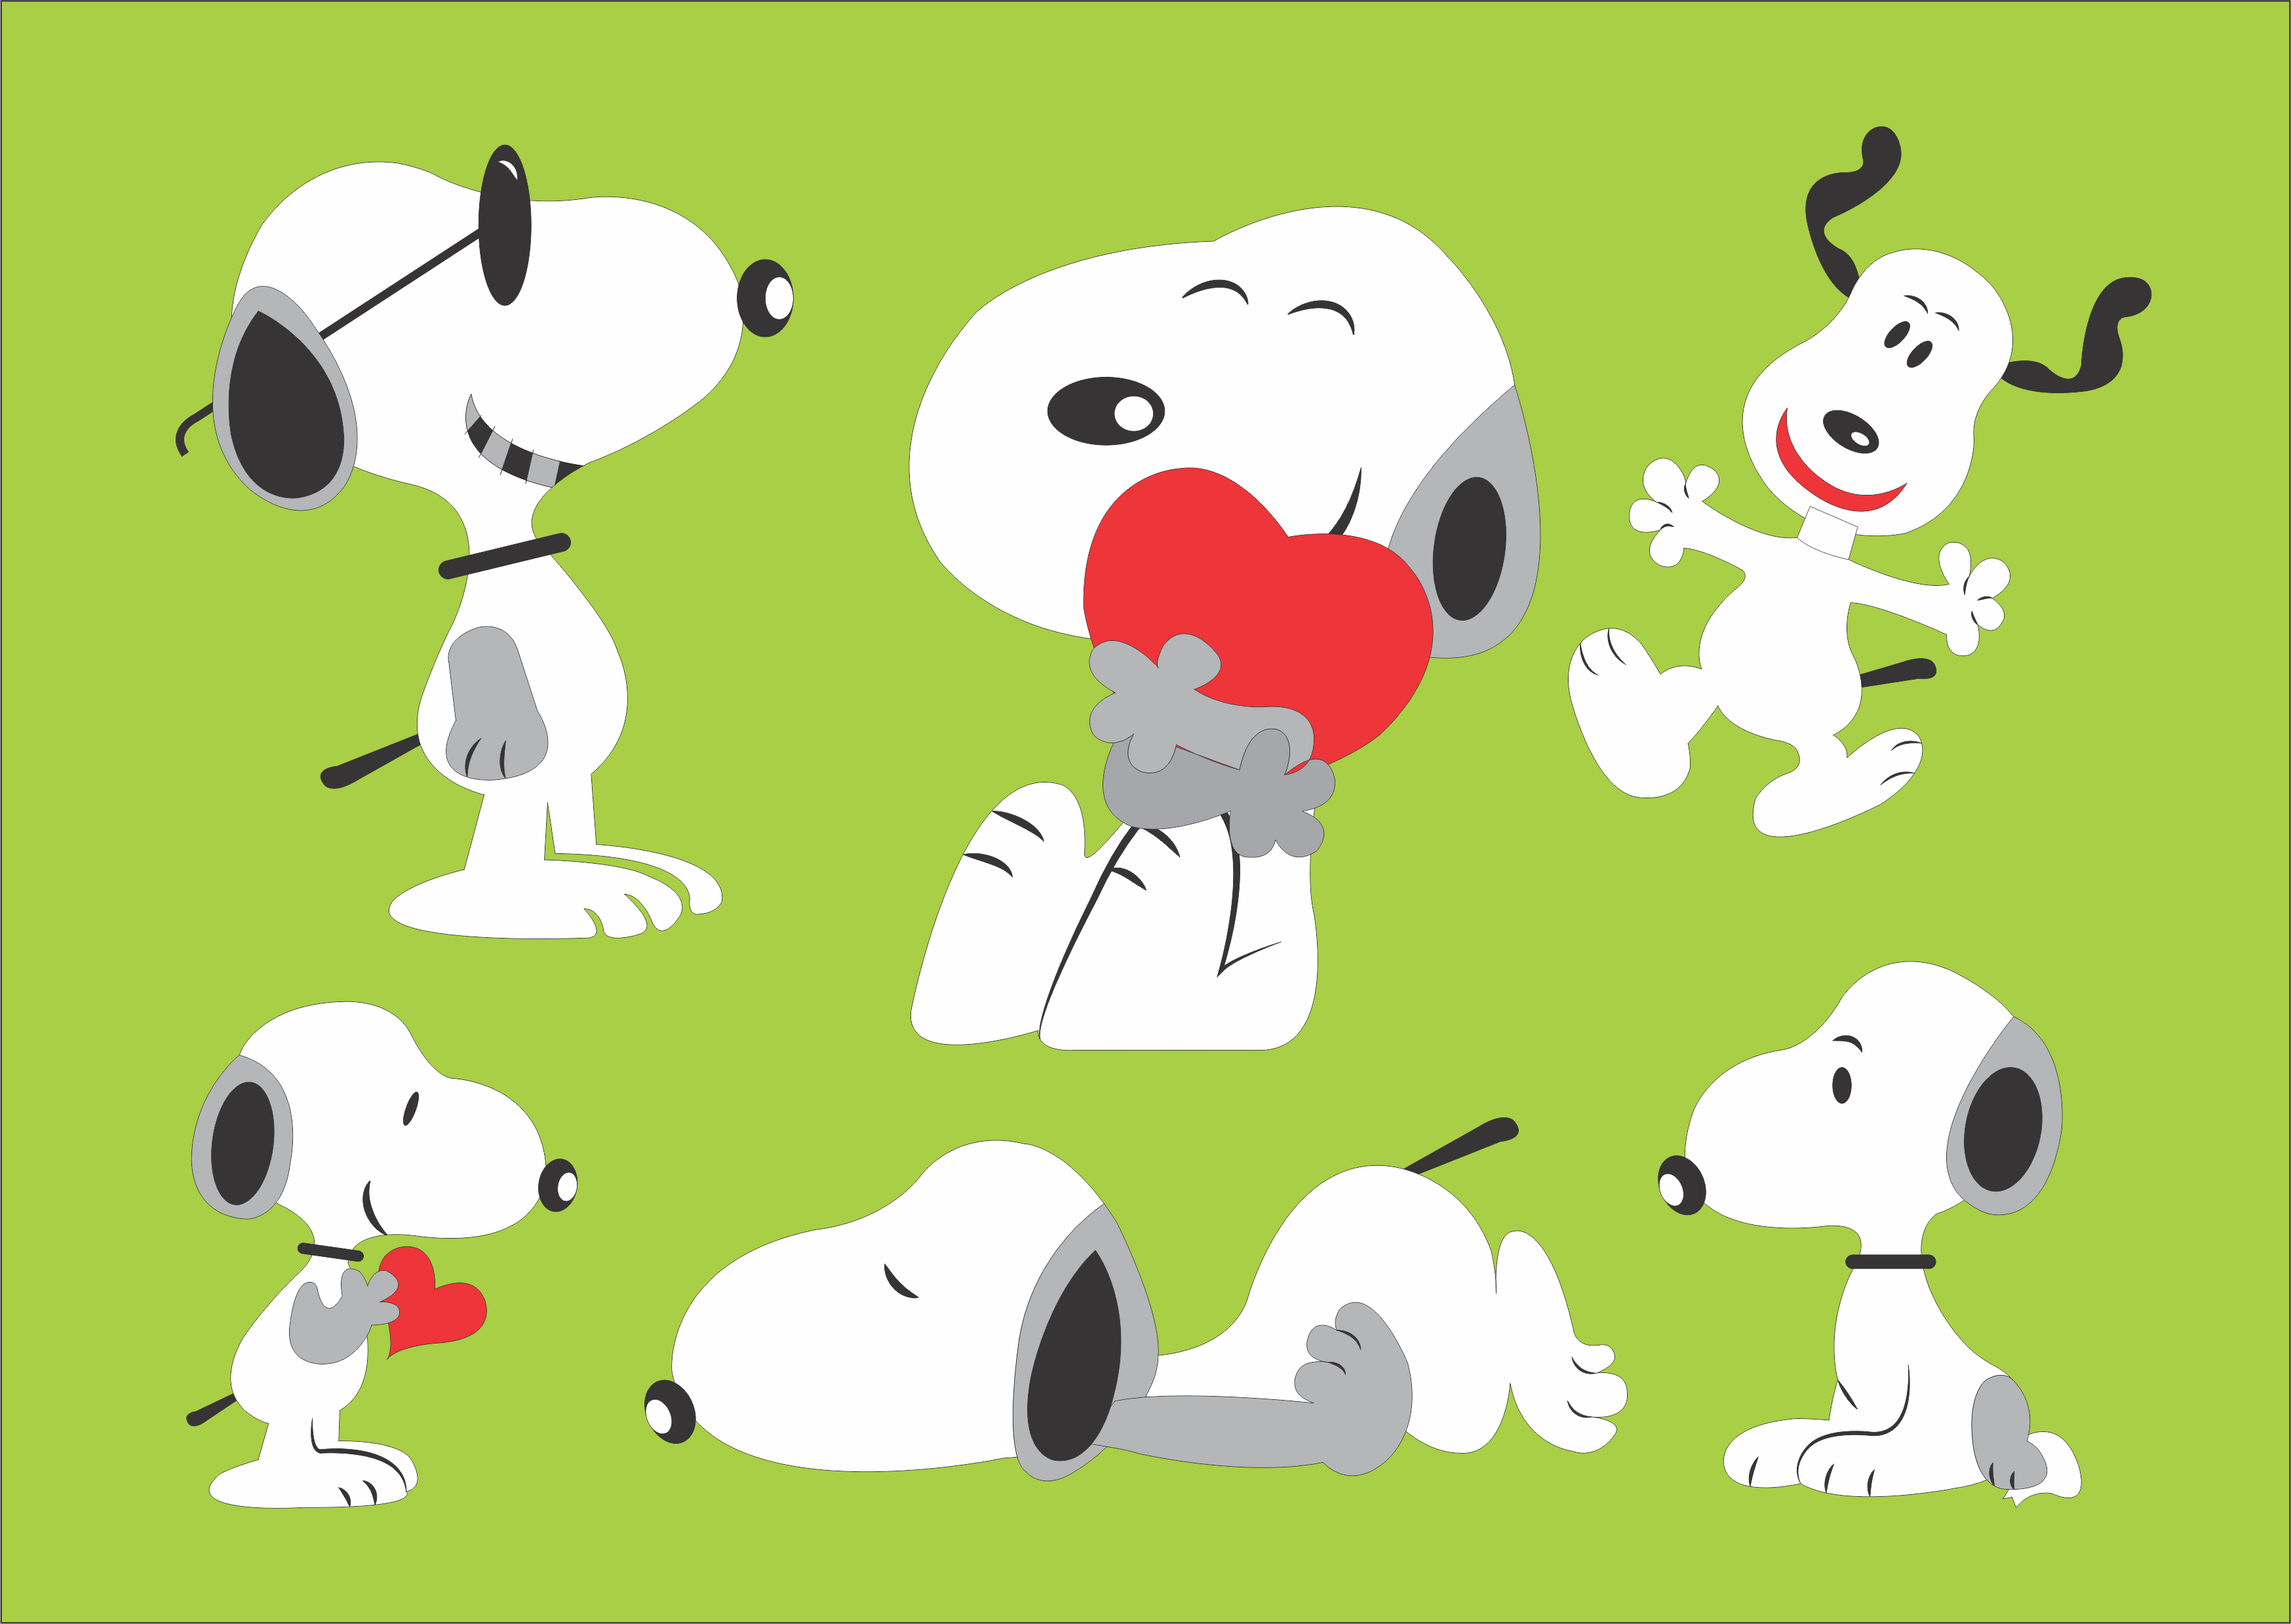 Snoopy svg Peanuts snoopy Peanuts svg Snoopy gift Snoopy.